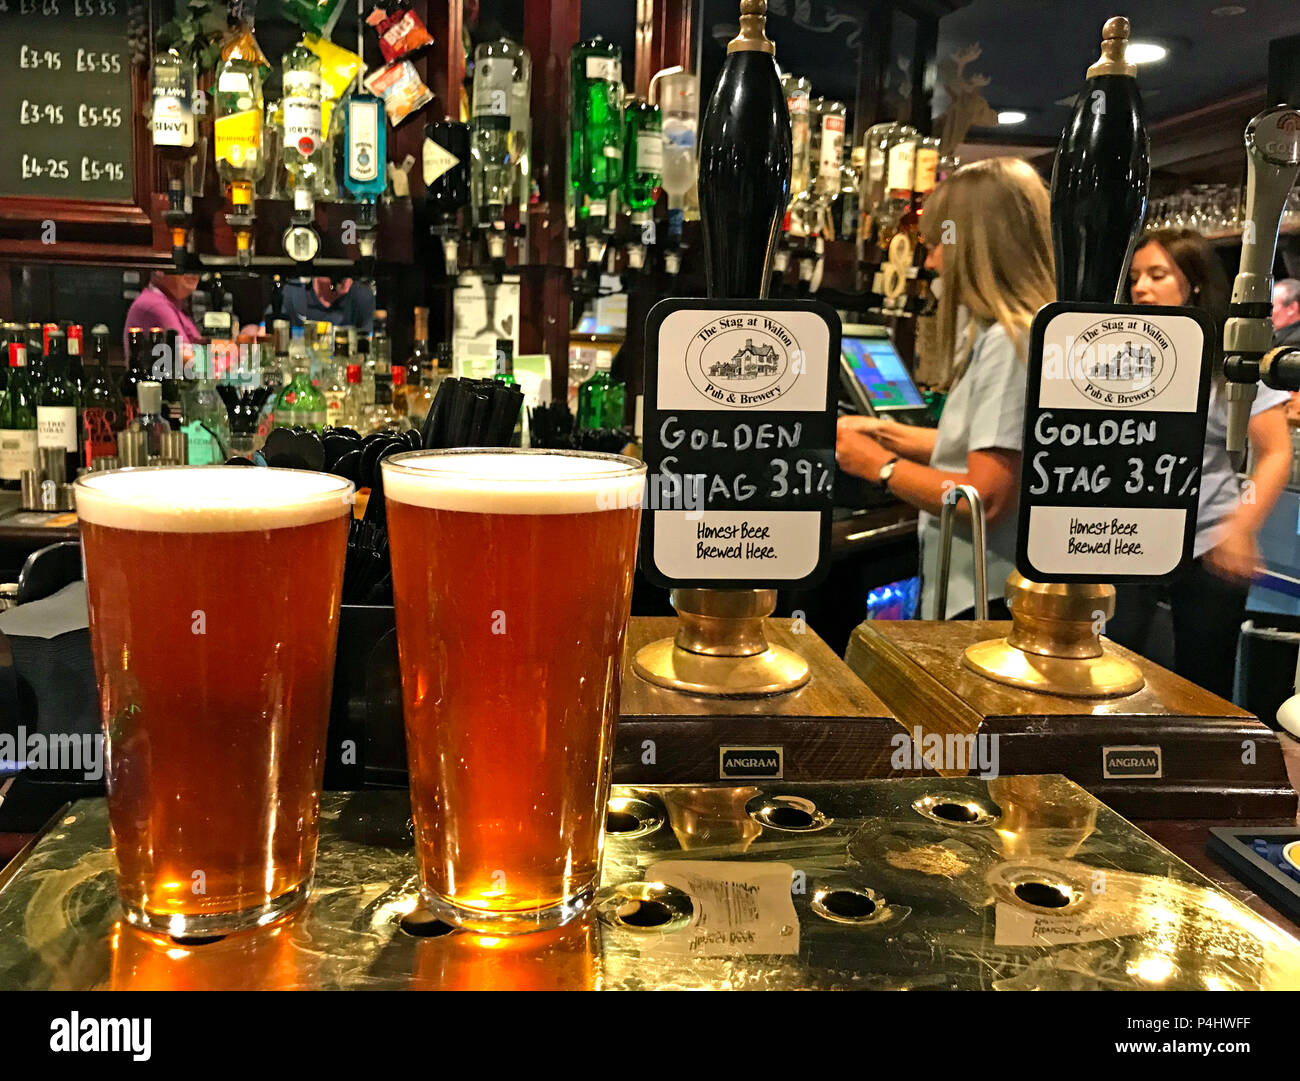 GoTonySmith,@HotpixUK,HotpixUK,drinks,drink,alcoholic,pub,bar,Golden Stag,Brewhouse,Walton Warrington,Warrington,WA4,Cheshire,England,UK,two pints on a bar,two pints